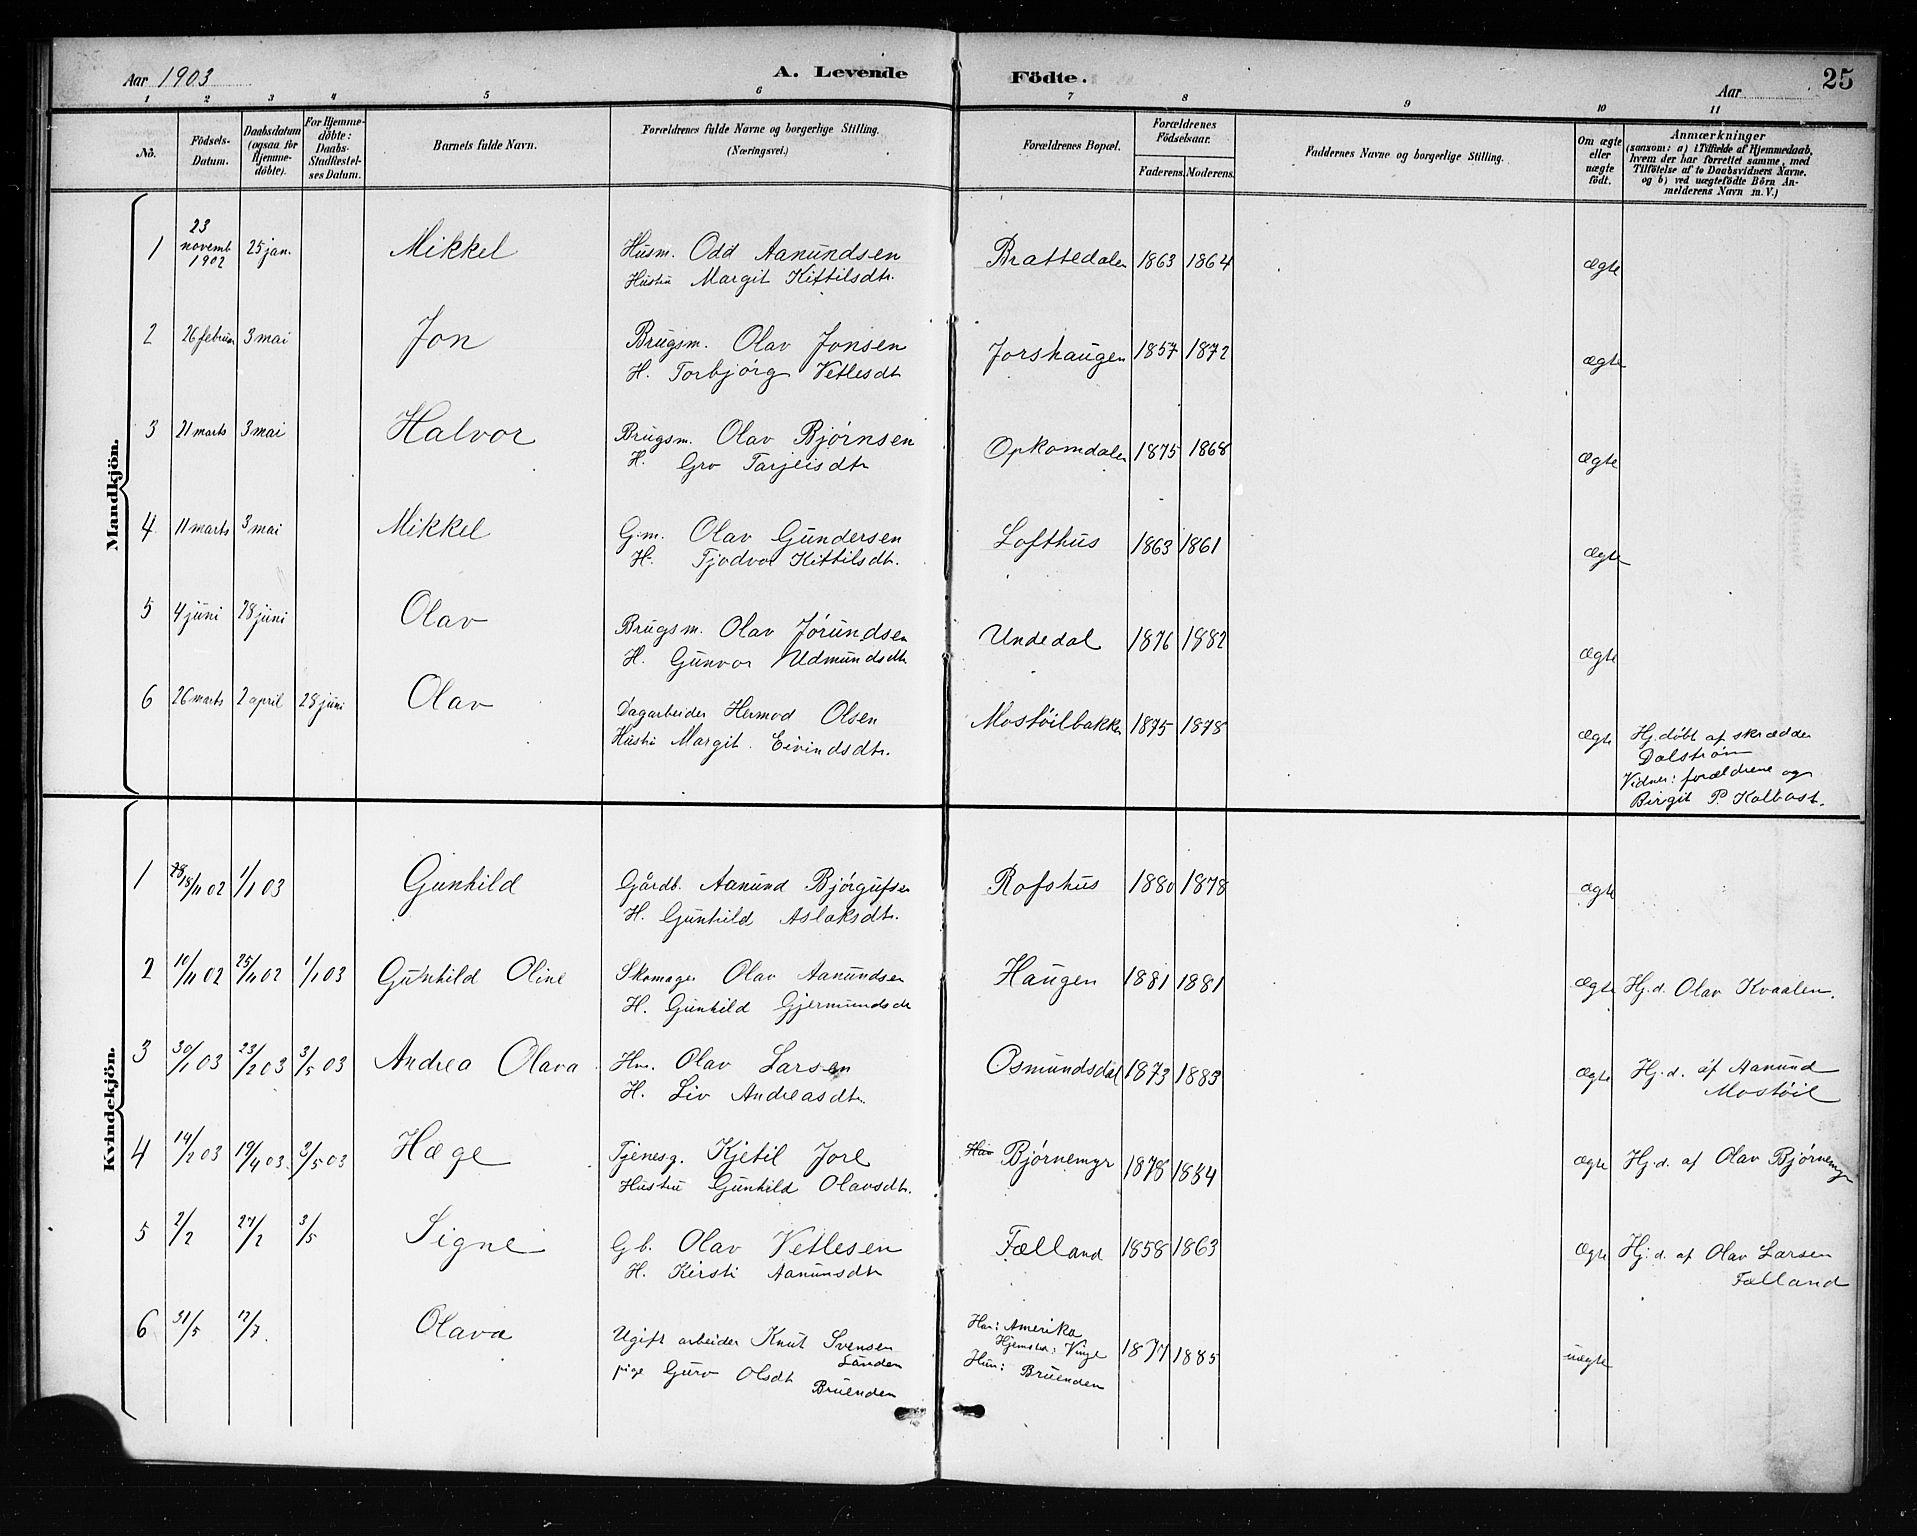 SAKO, Mo kirkebøker, G/Ga/L0002: Klokkerbok nr. I 2, 1892-1914, s. 25